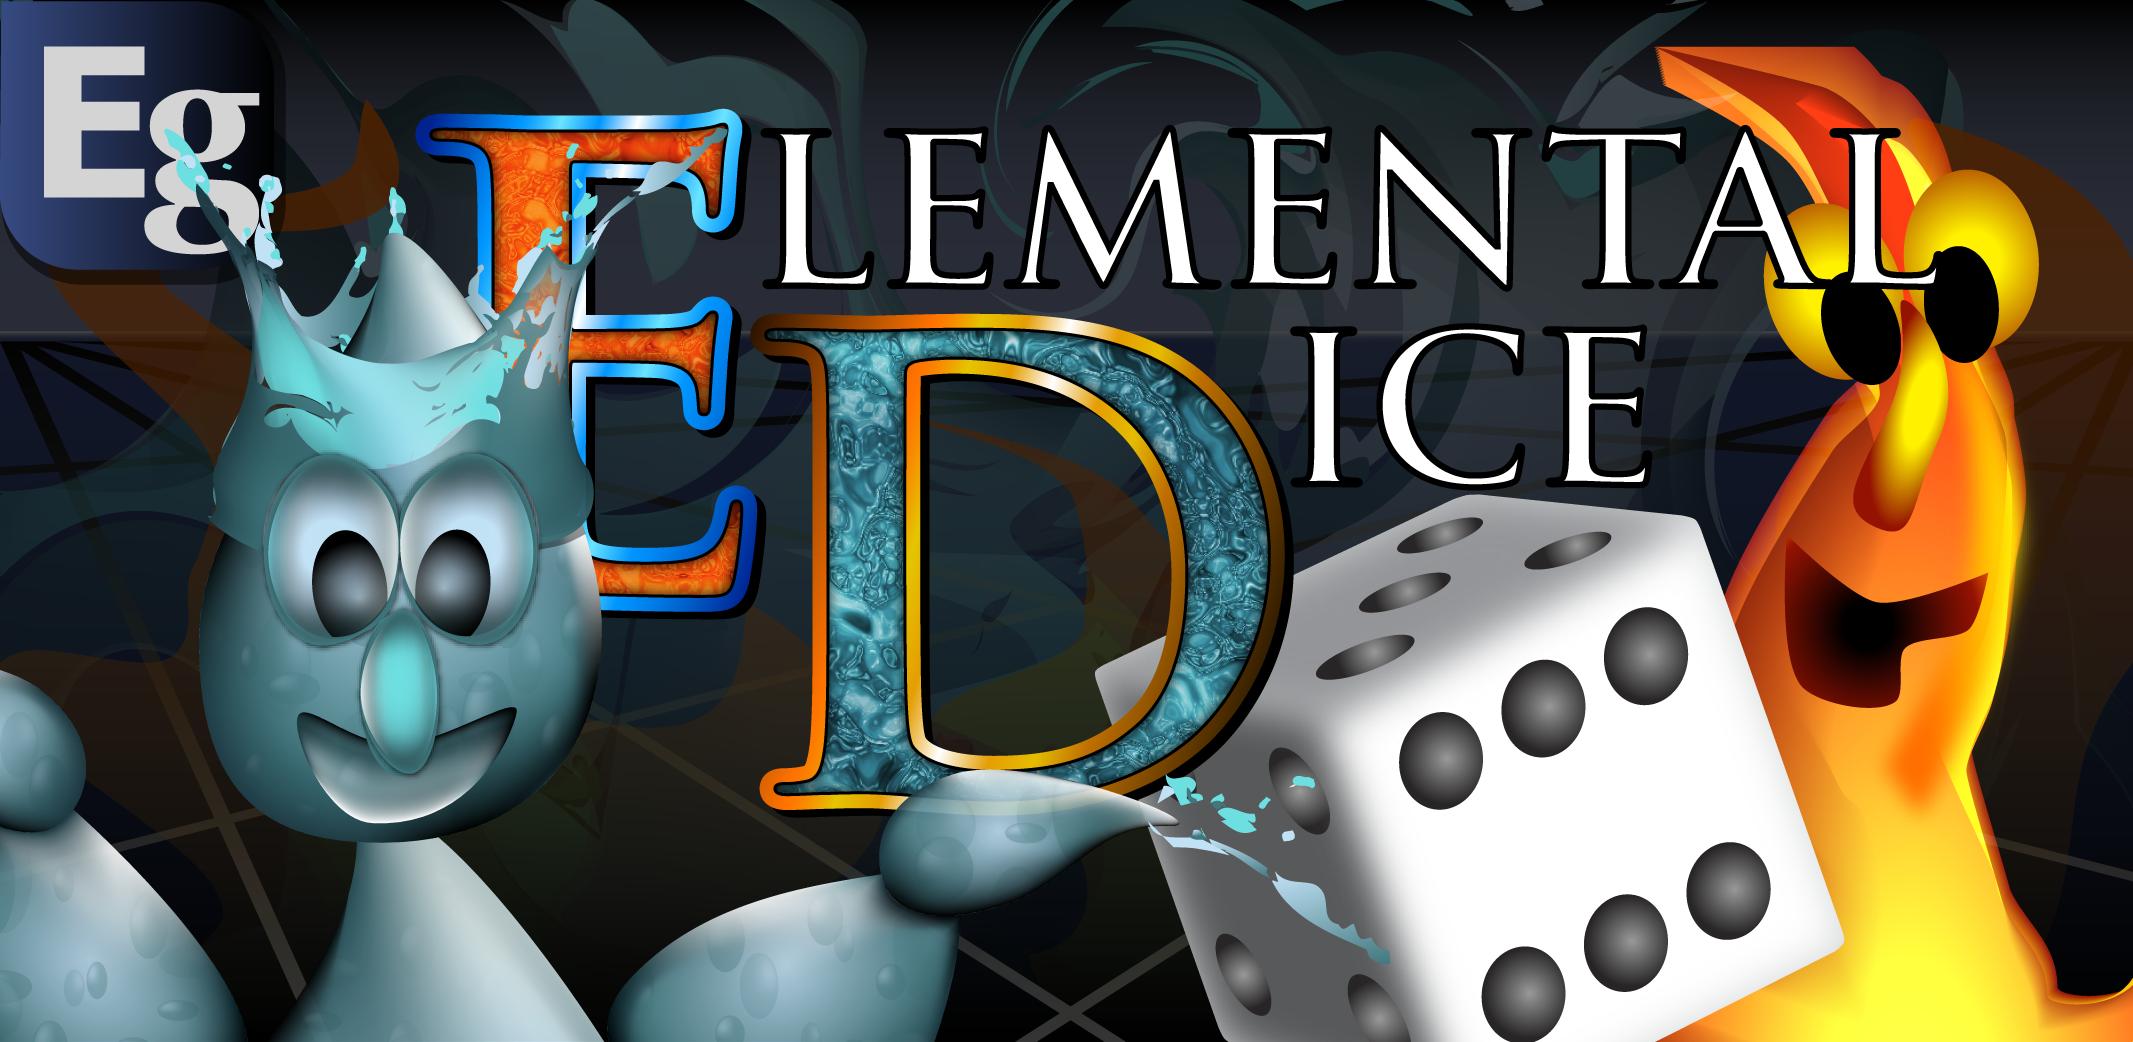 Elemental Dice